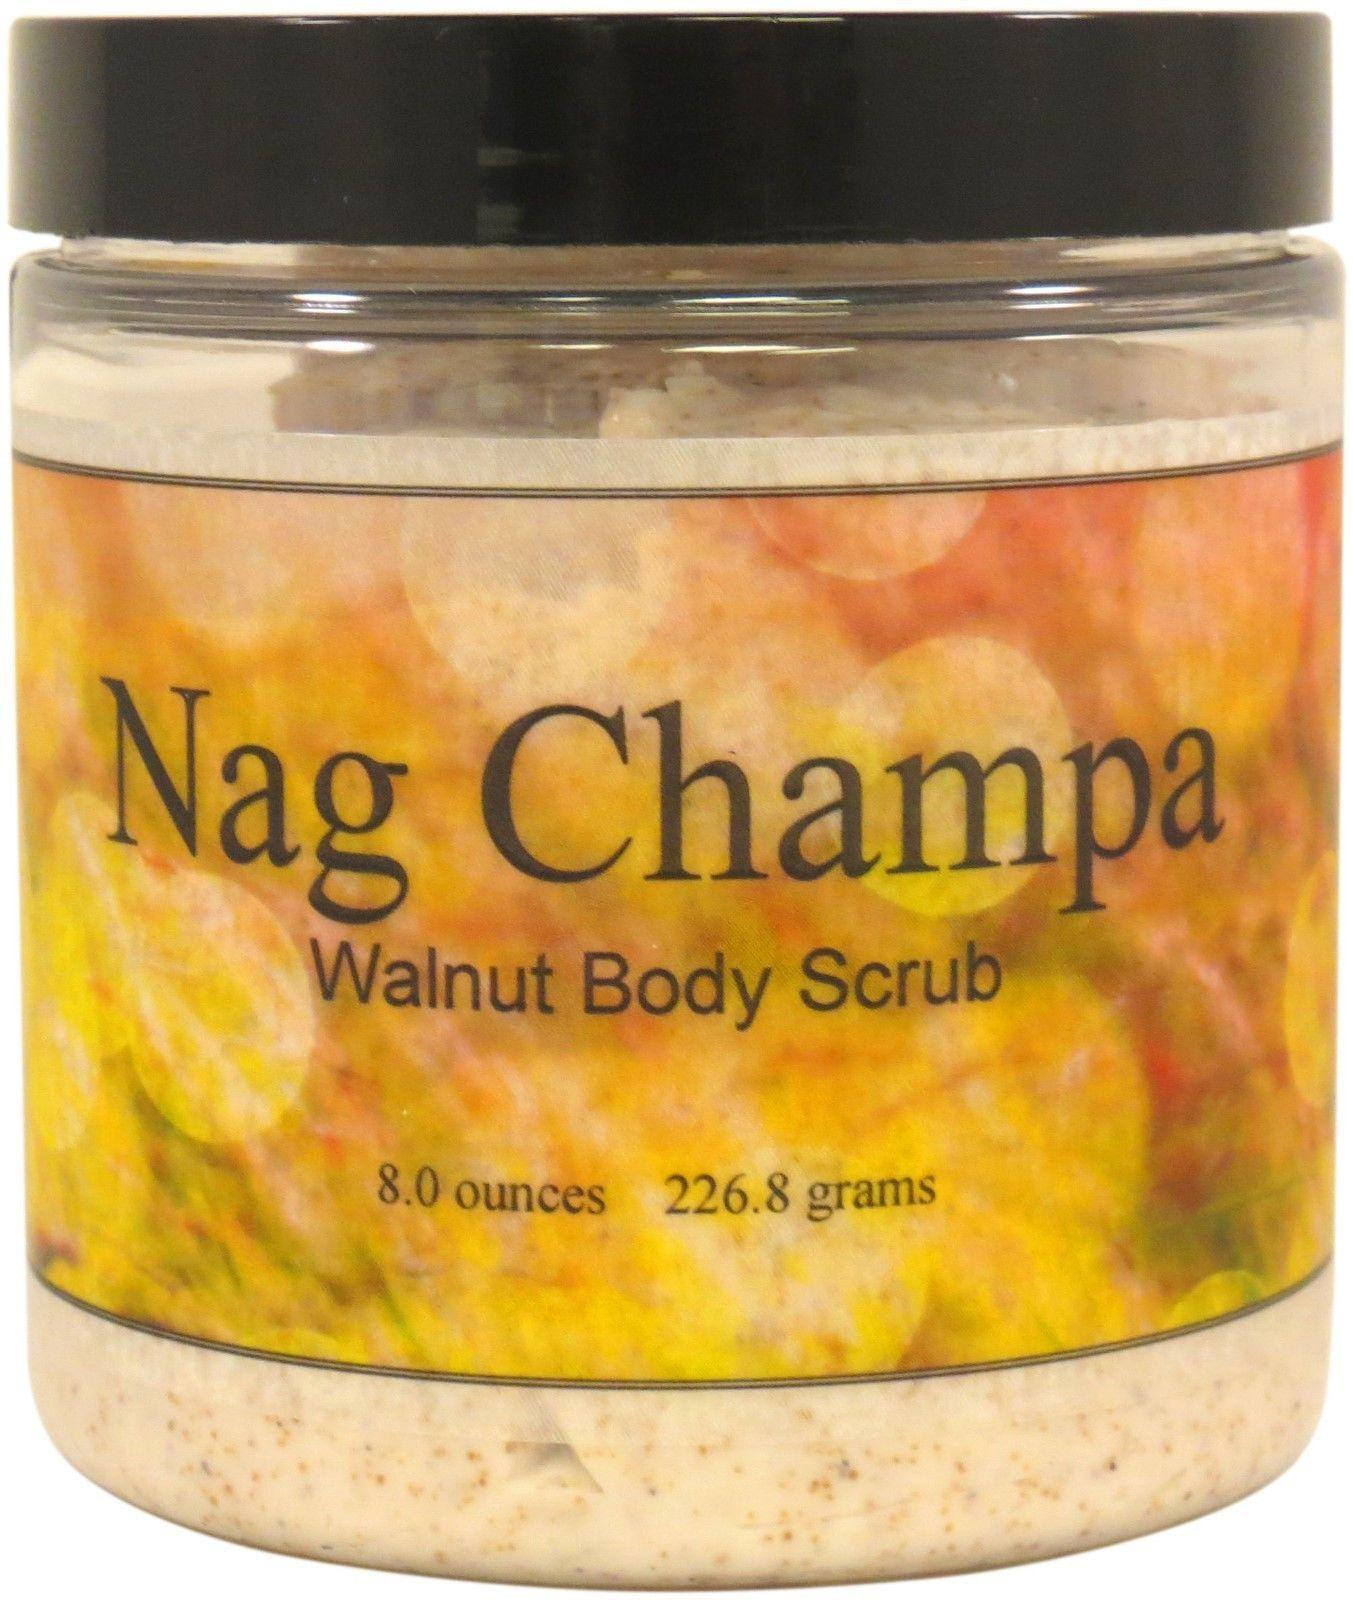 Nag Champa Walnut Body Scrub